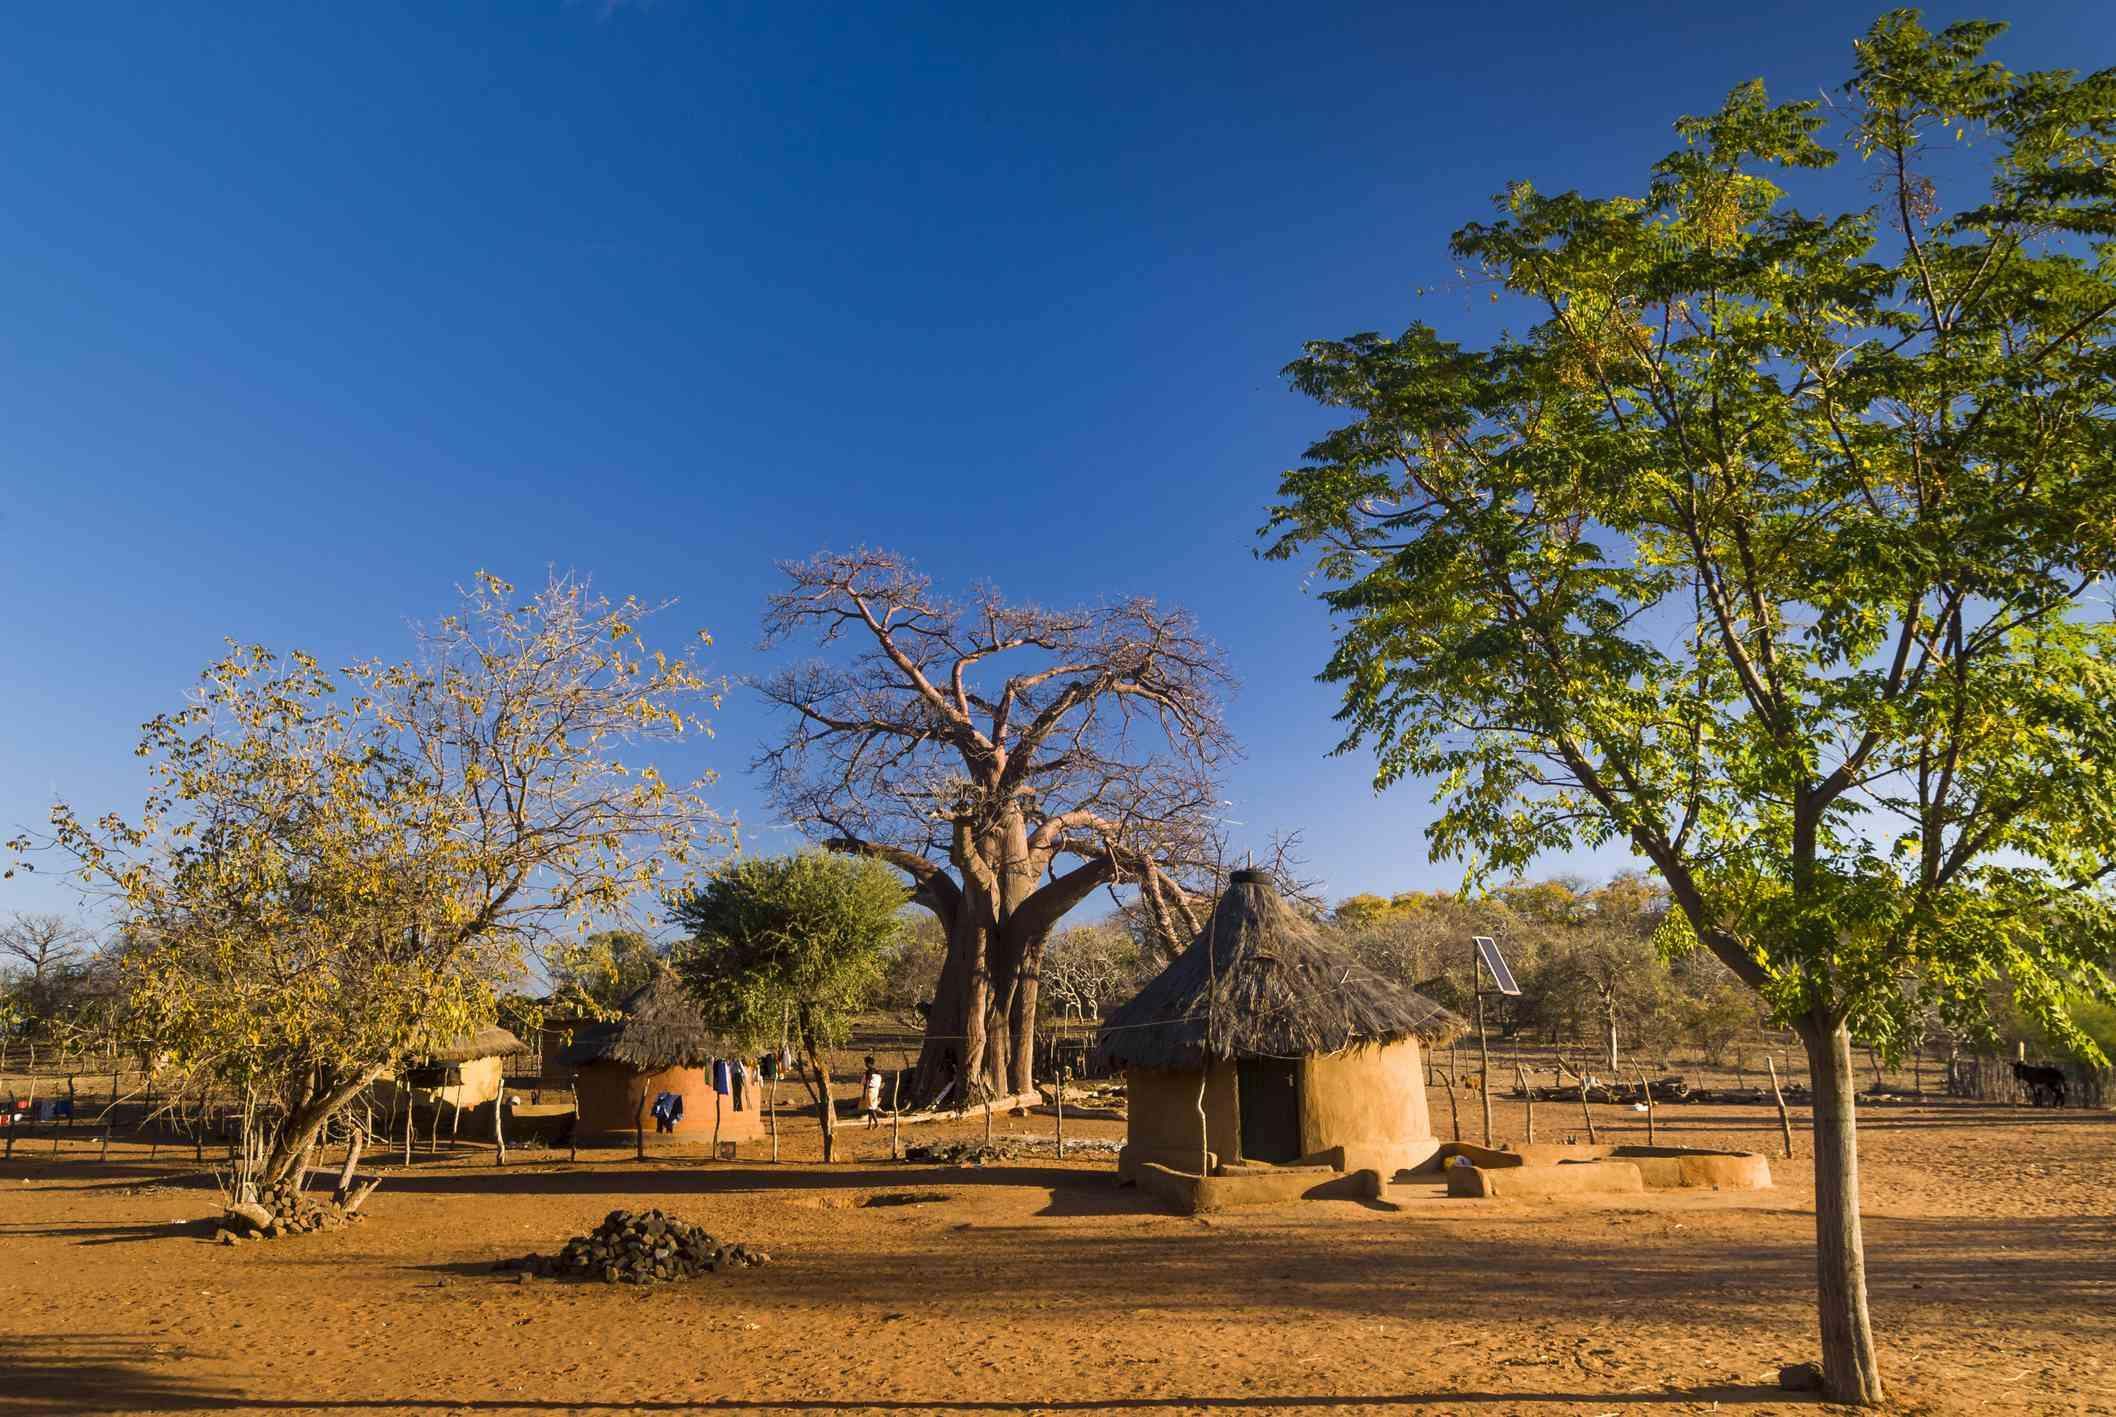 Tribal village in the Venda region of South Africa